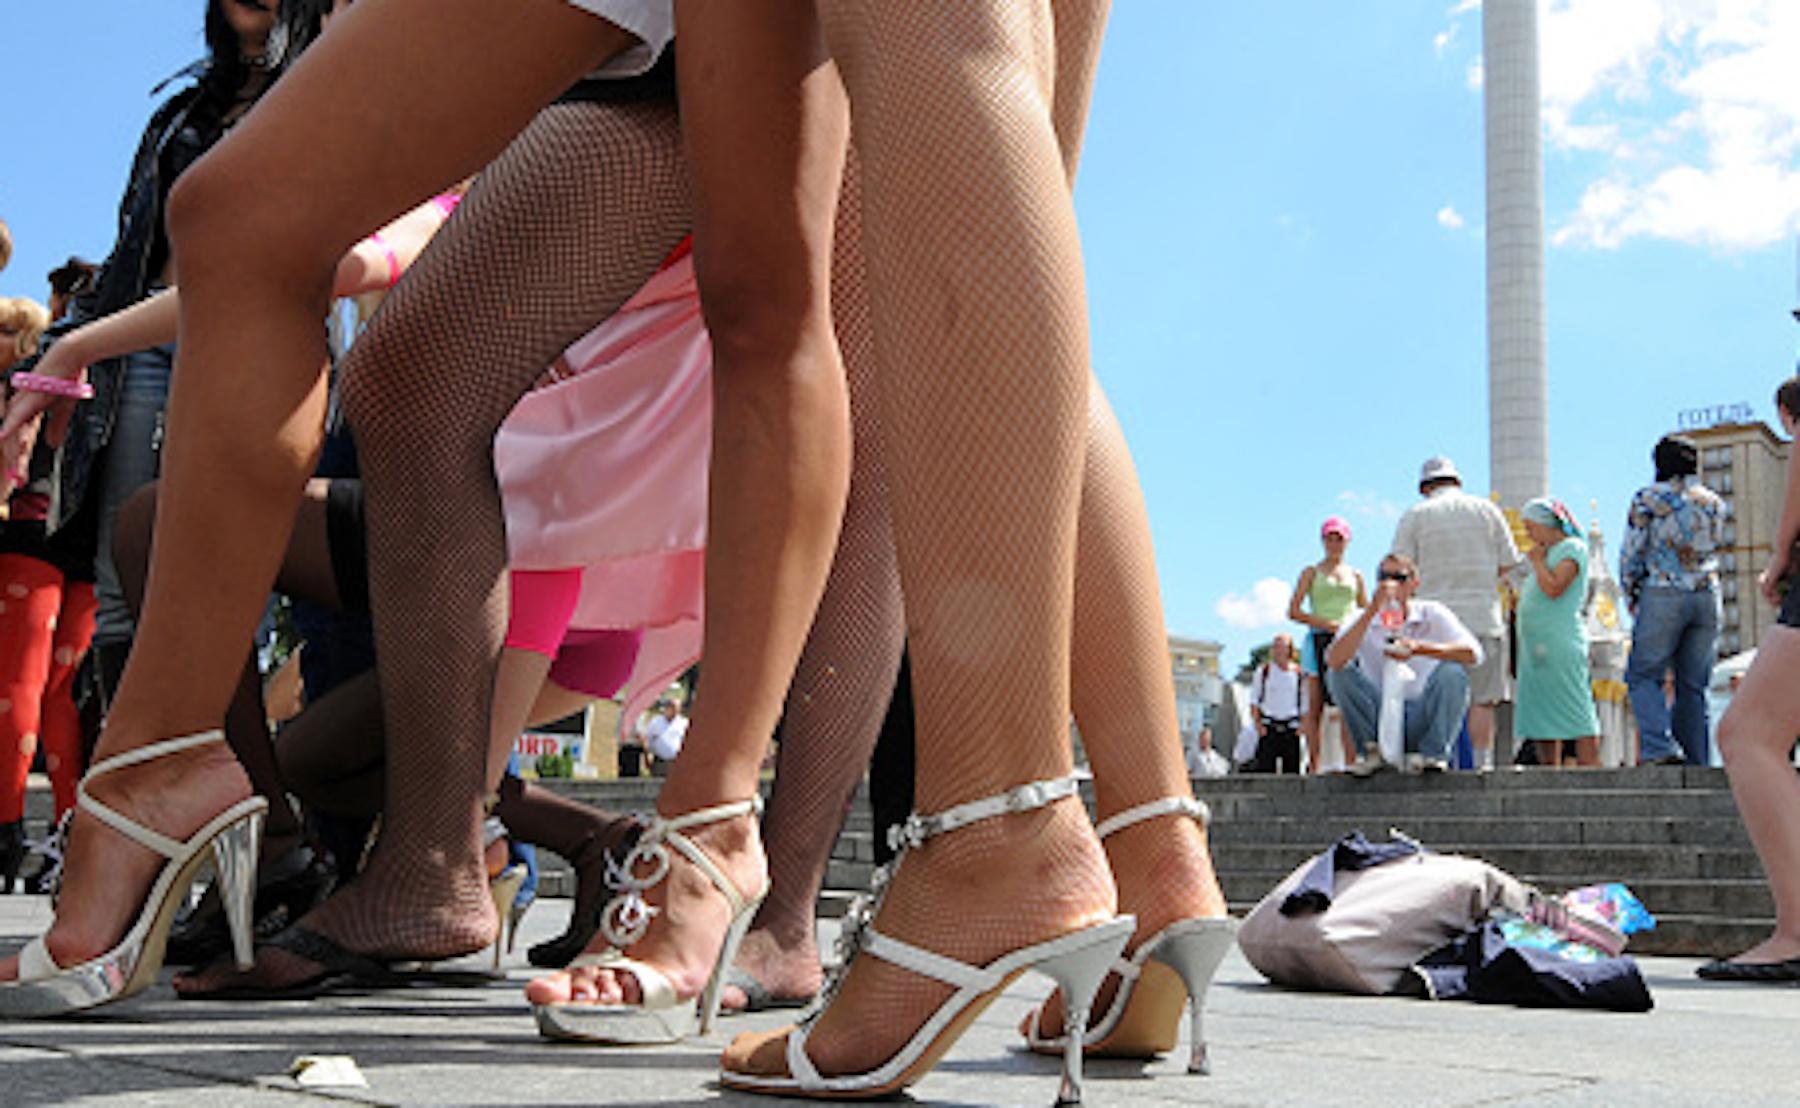 prostitution in brooklyn